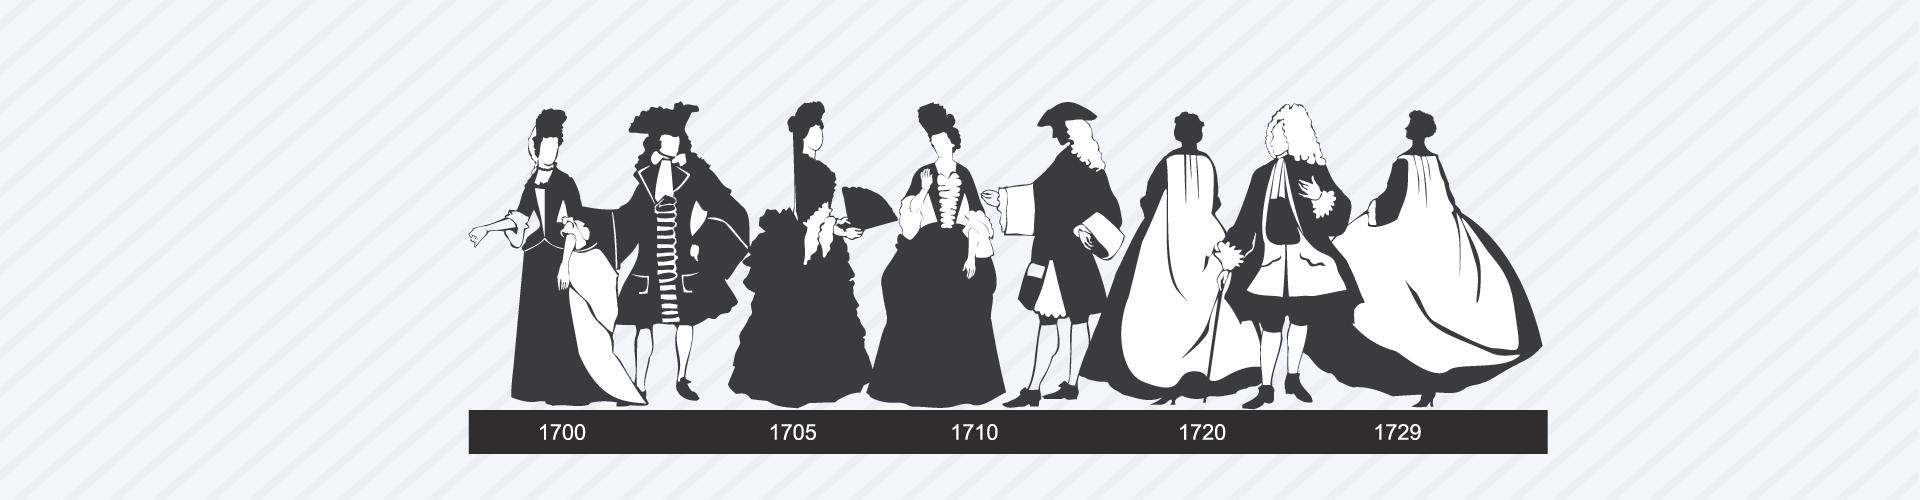 1700 to 1729